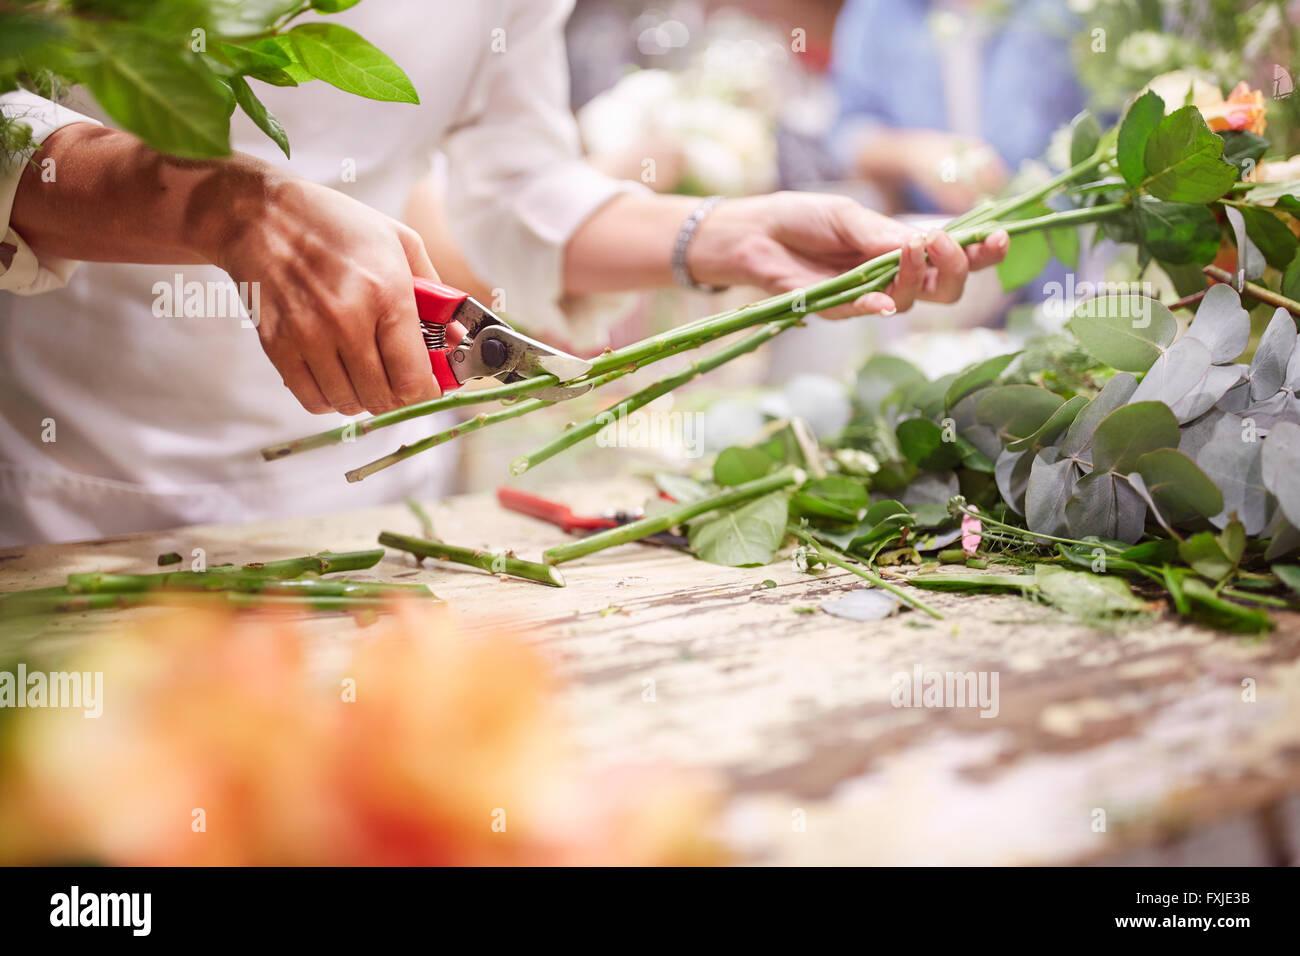 Florist trimming flower stems at flower shop - Stock Image